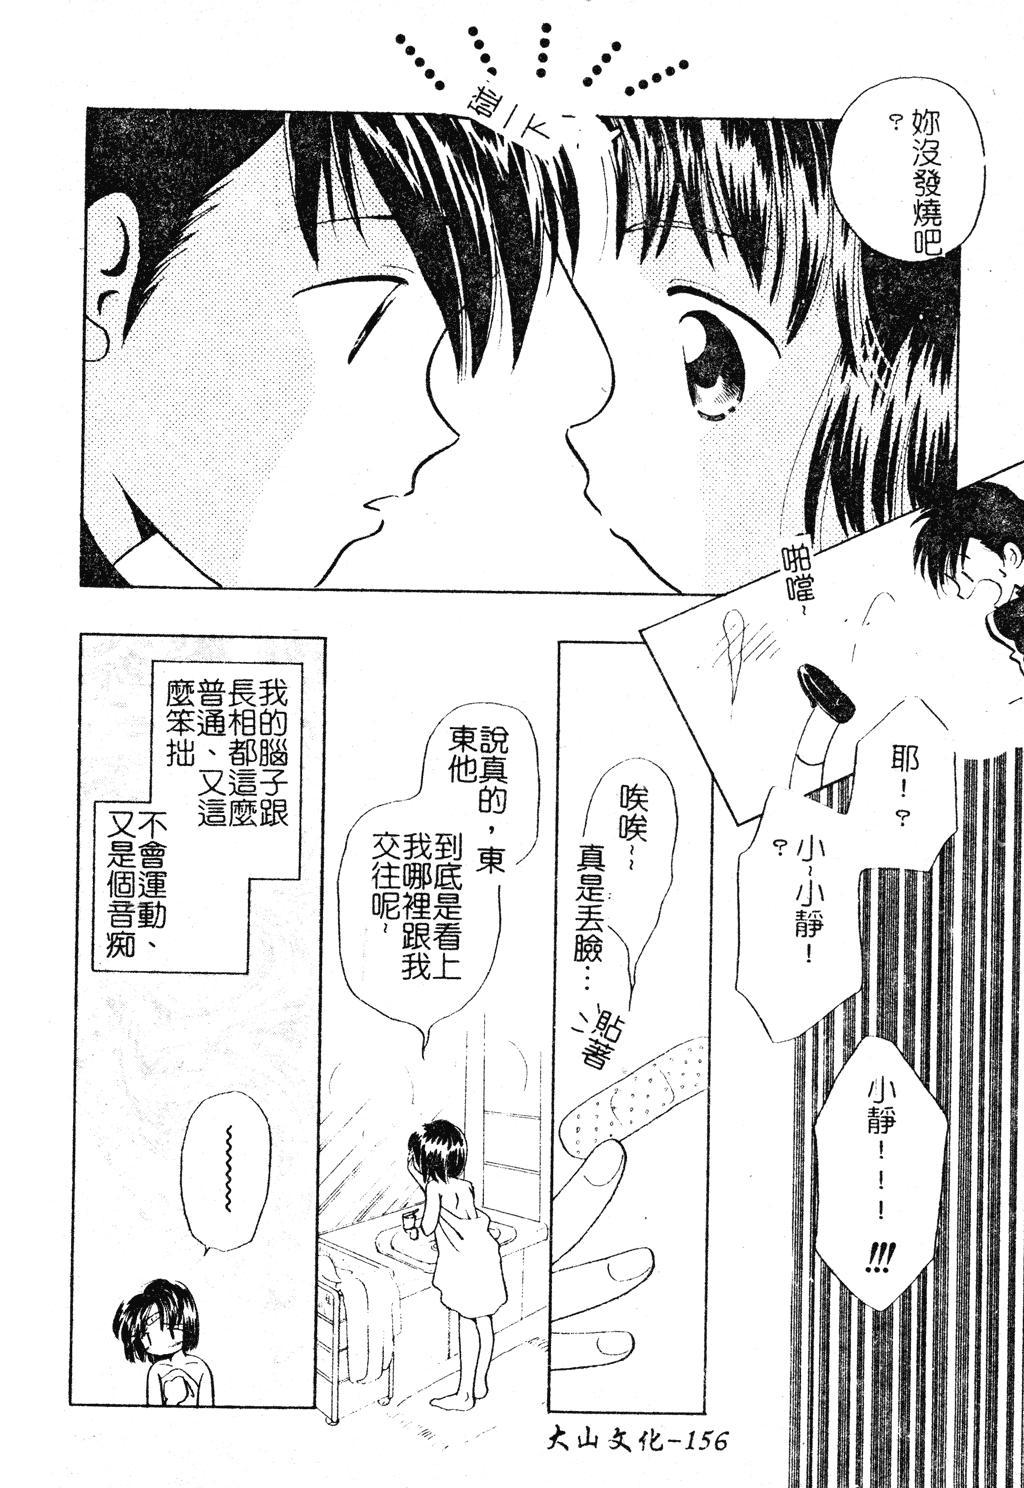 DenNow Koihime Collection 7 154